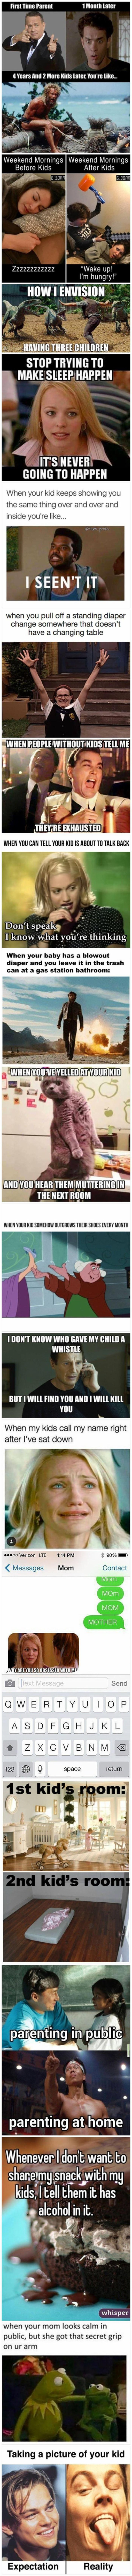 awesome Parenting Memes #ParentingMemes